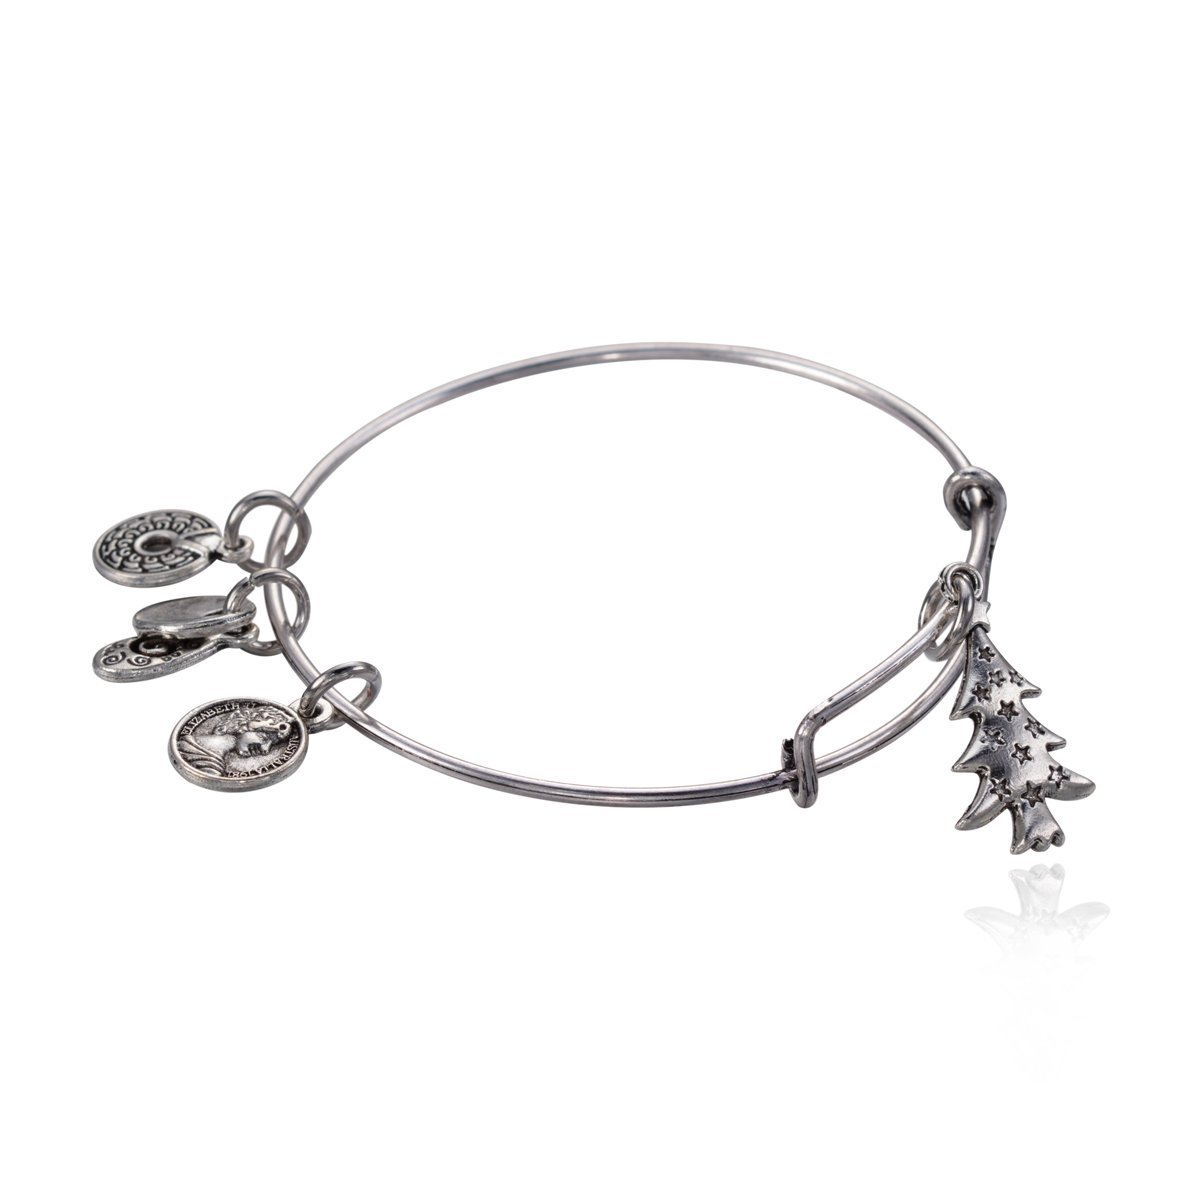 "Antique Silver Tone Expandable Wire Bangle Bracelet; ""Christmas Tree"" Pendant"